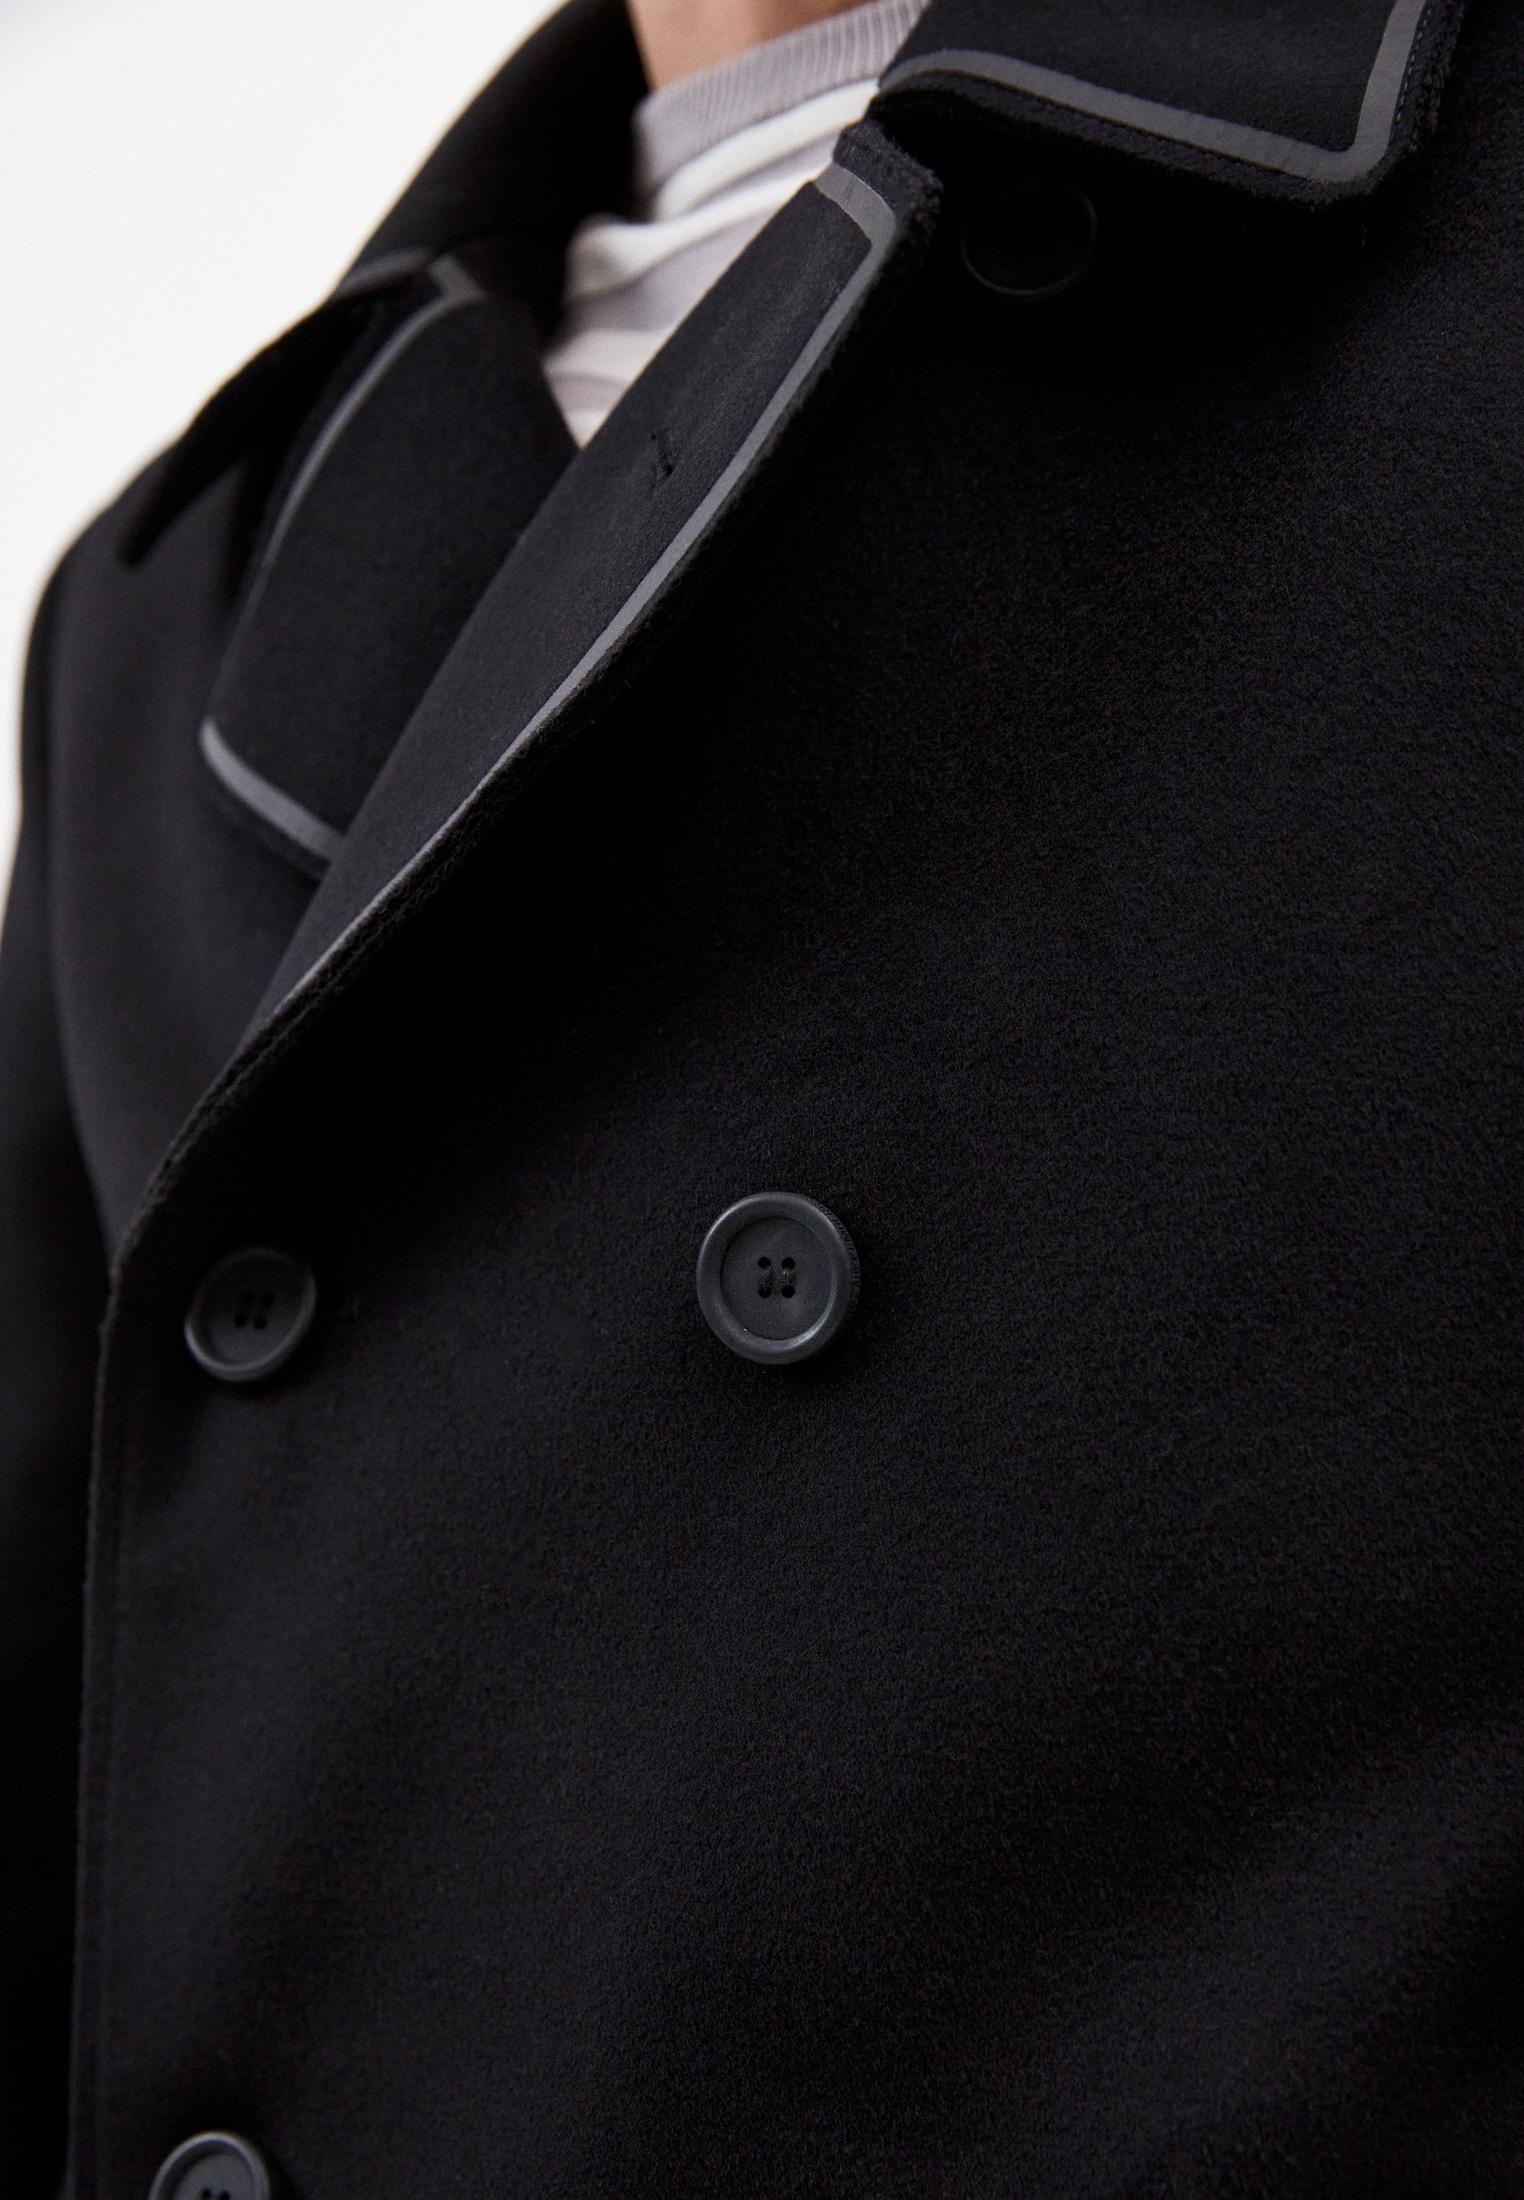 Мужское пальто Bikkembergs (Биккембергс) C J 005 01 T 9220: изображение 6